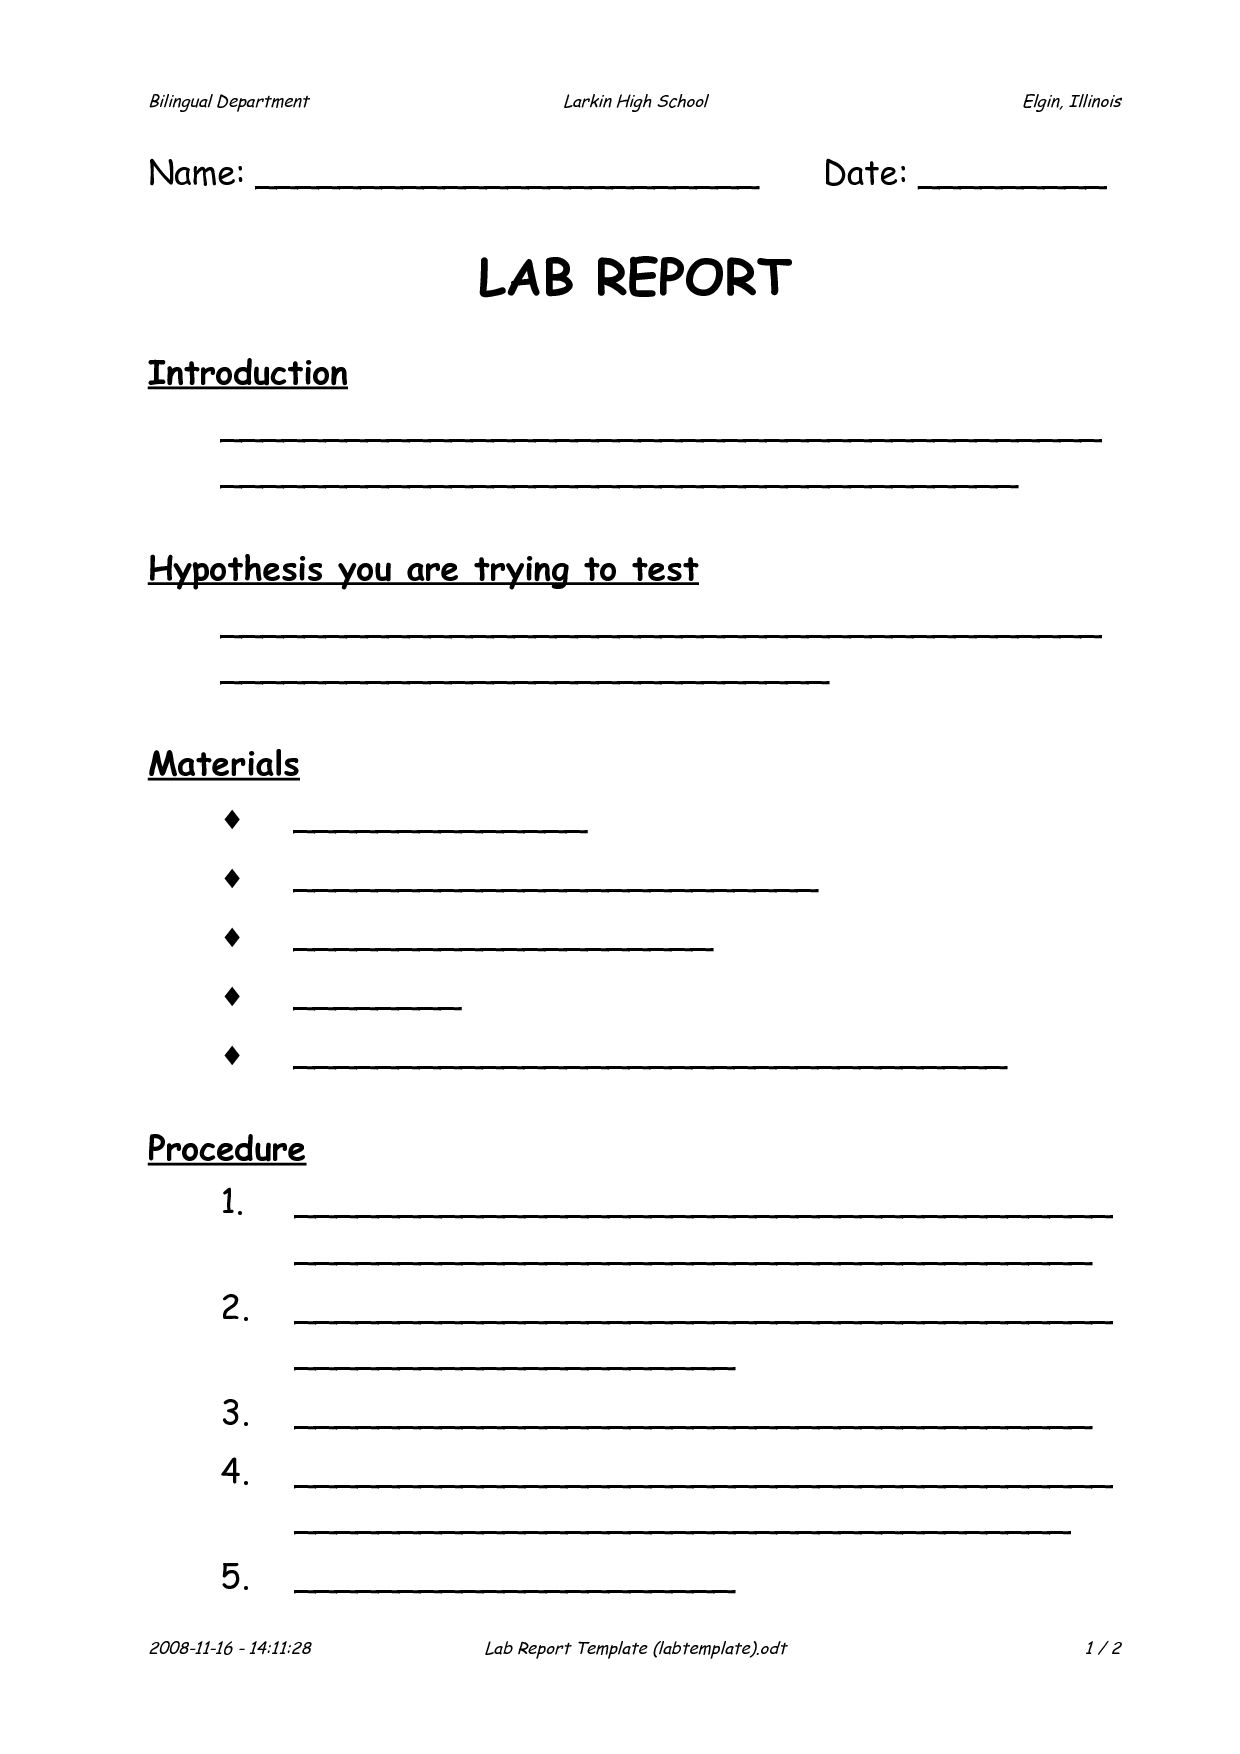 003 Template Ideas Lab Report Middle School Impressive With Regard